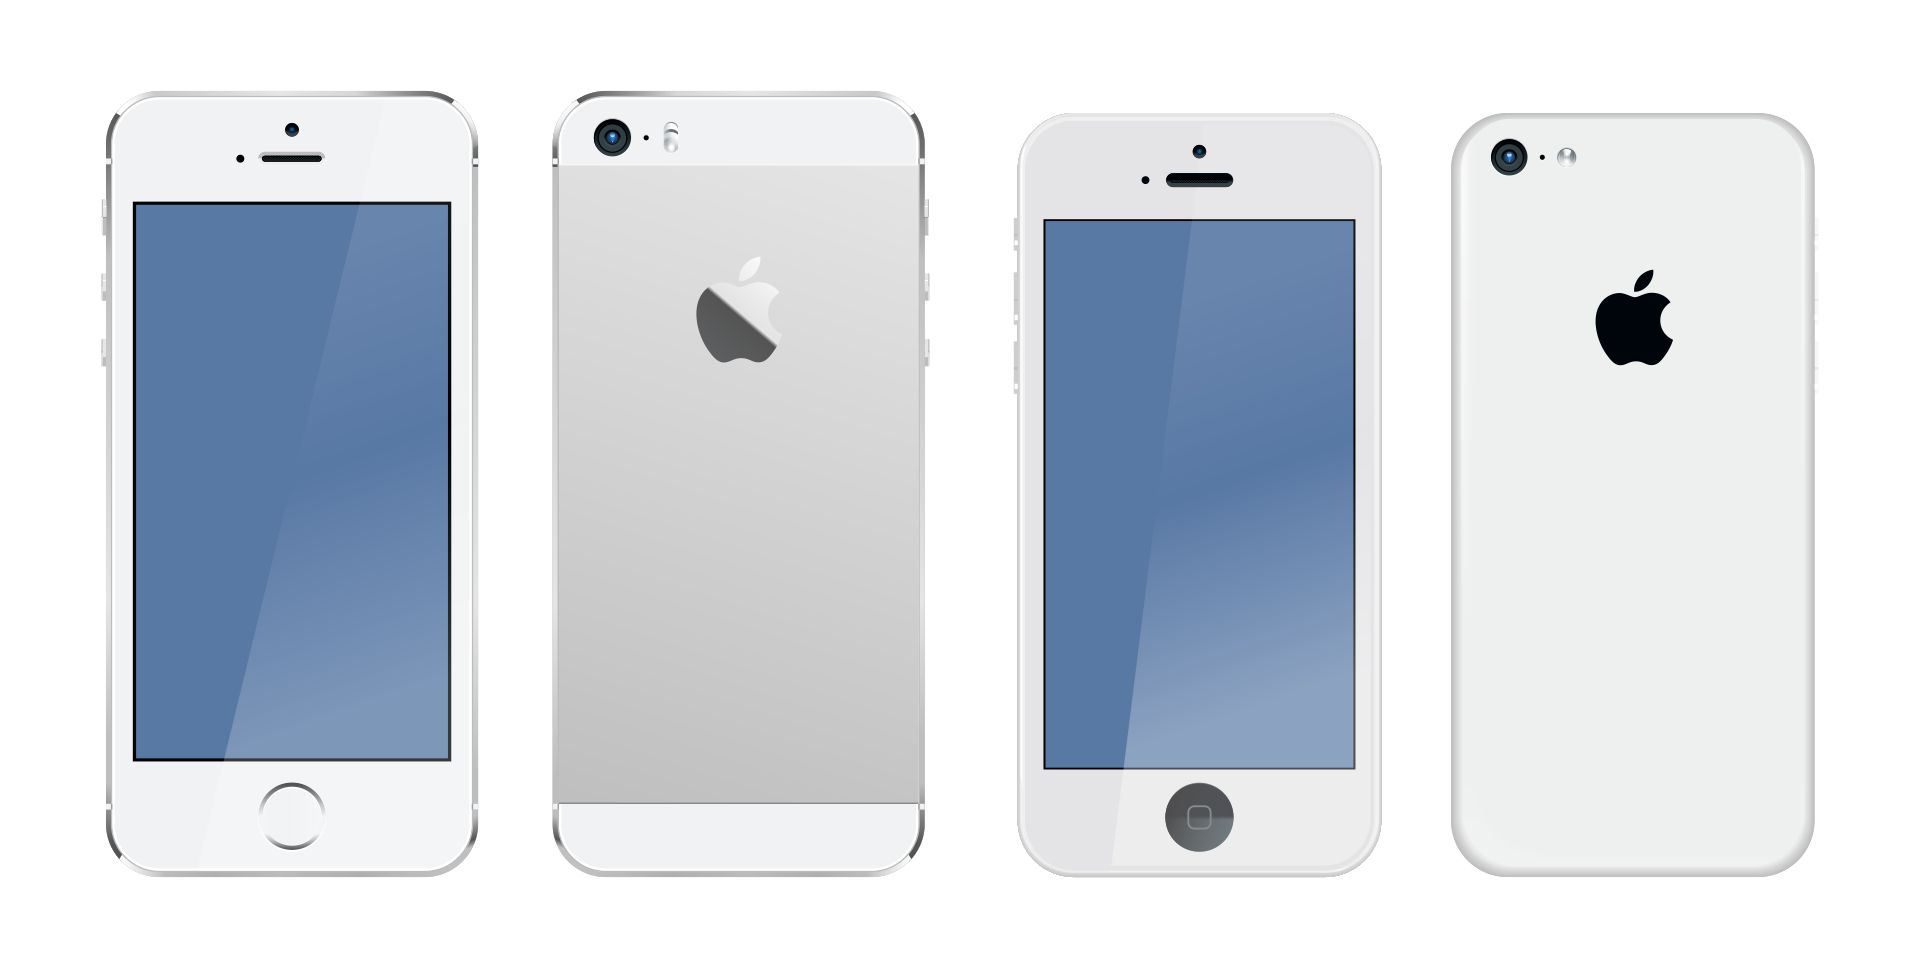 Printable Mini iPhone Pictures of Phones